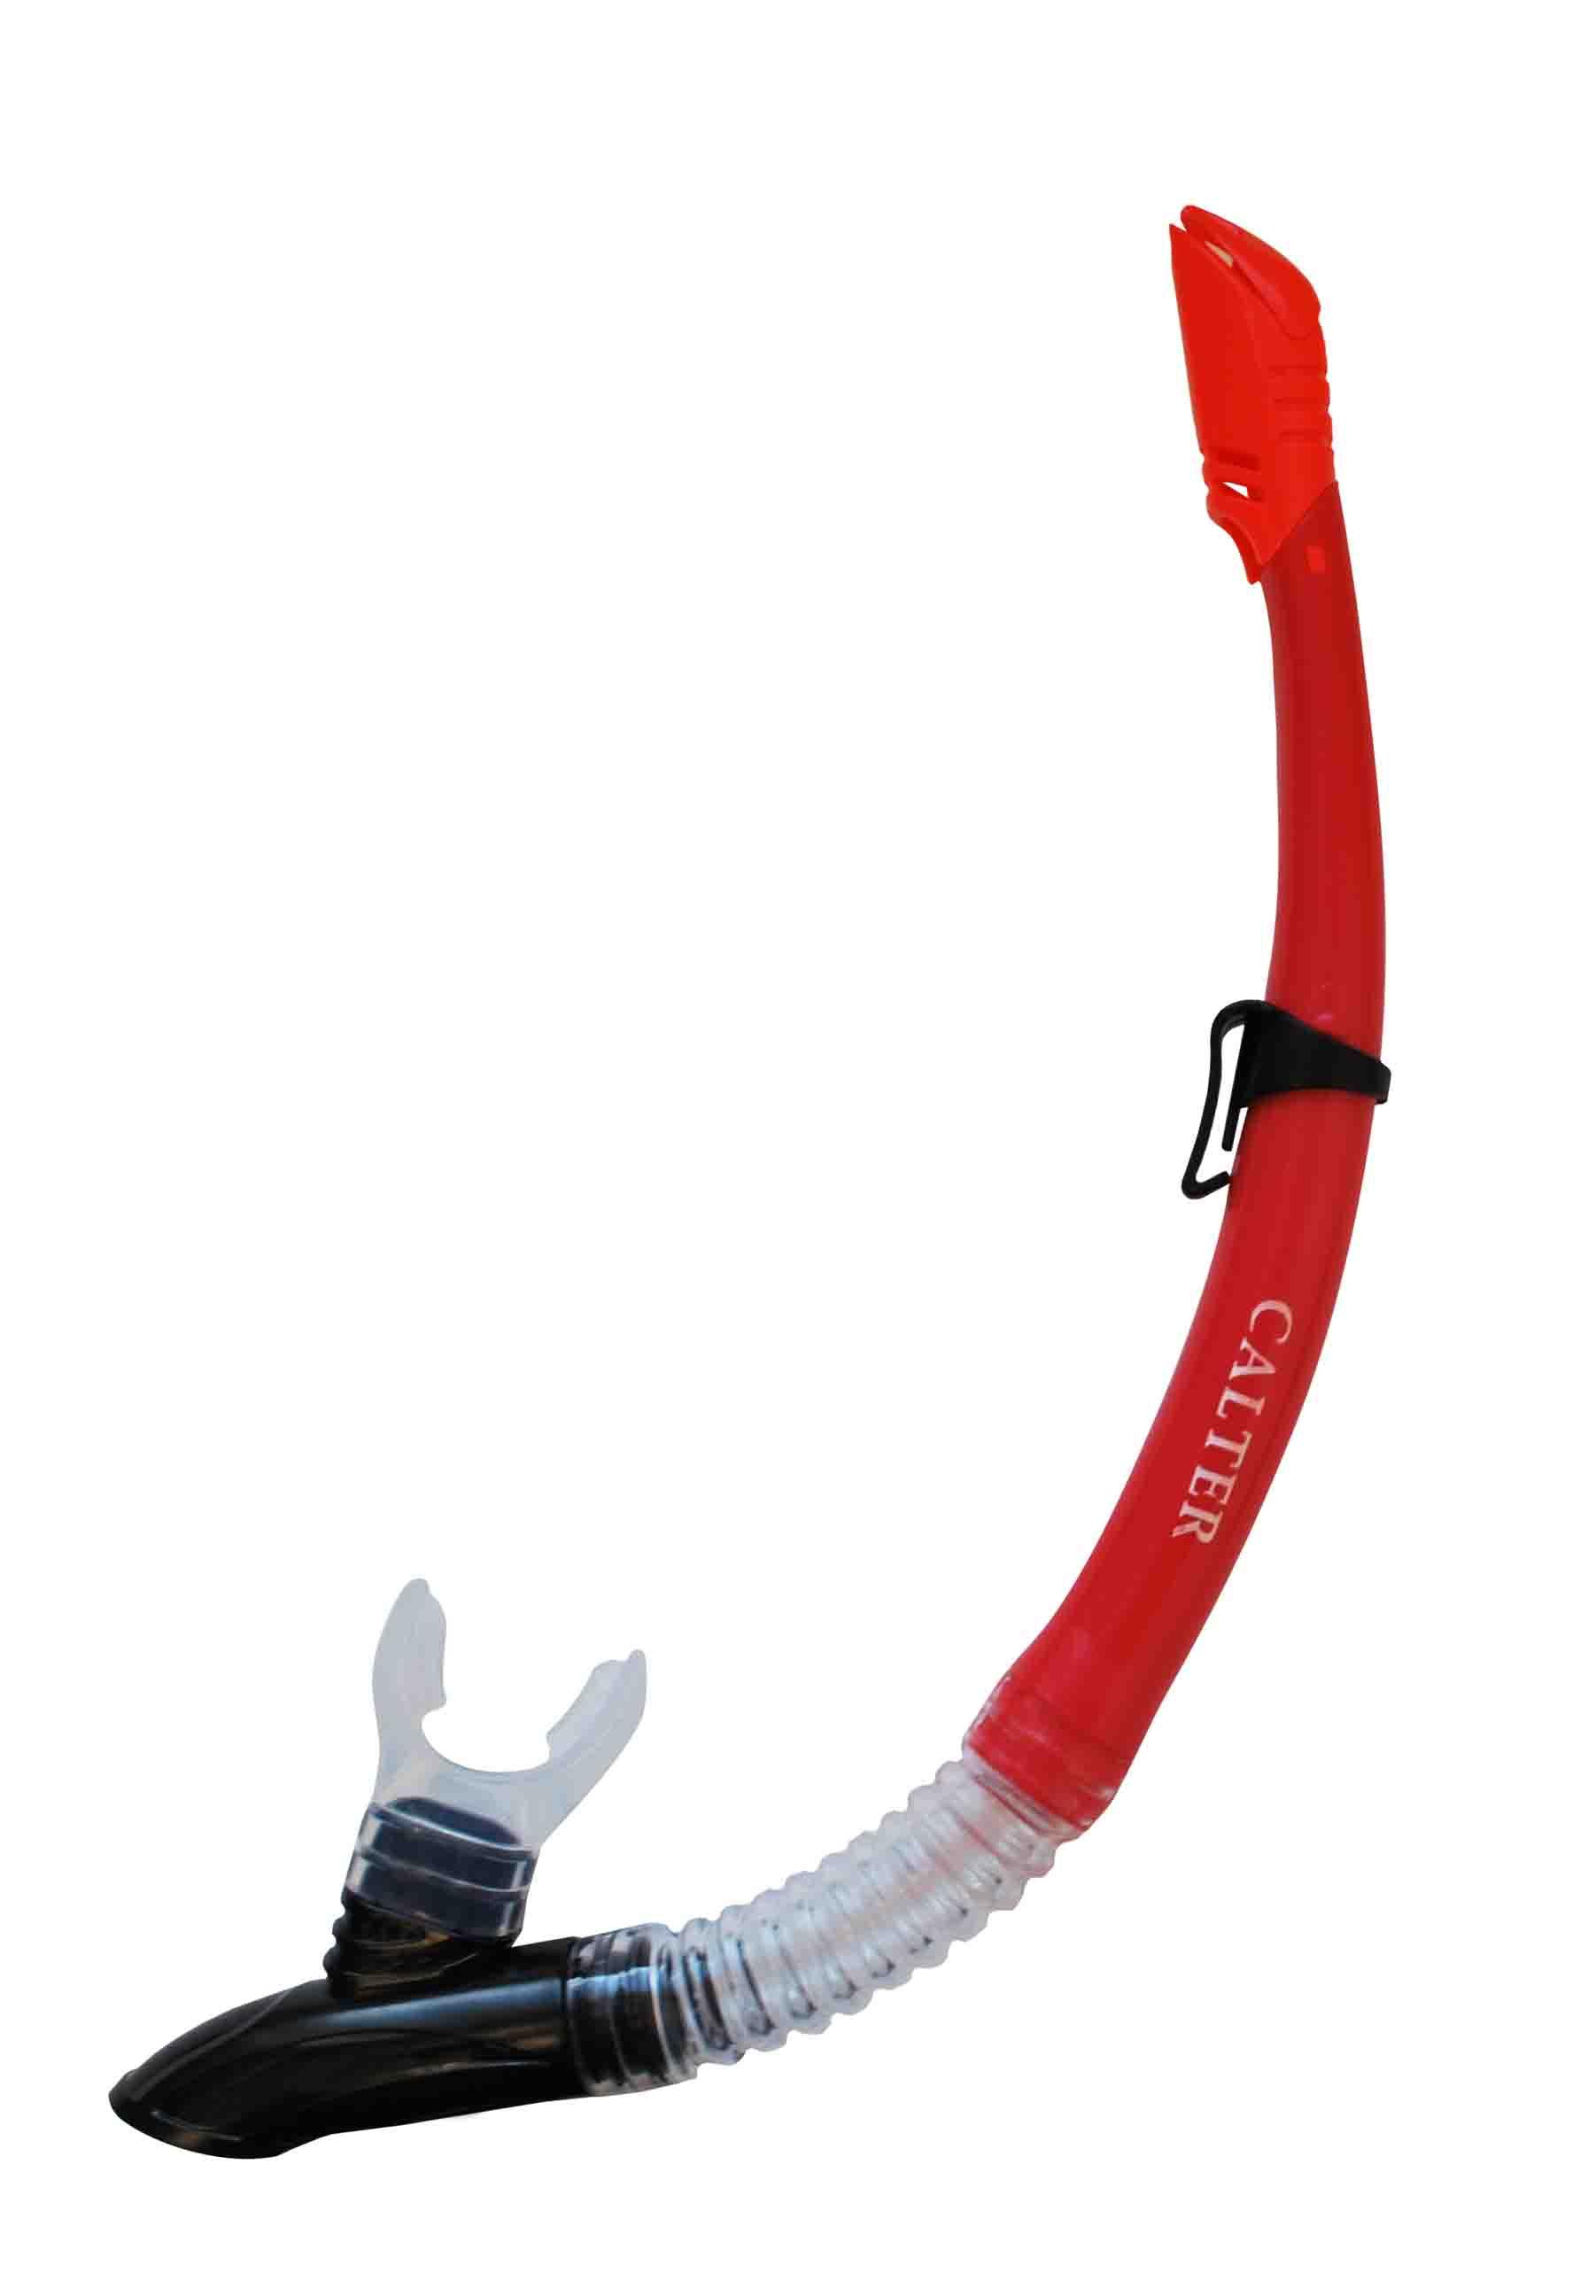 Šnorchl CALTER ADULT 63PVC-SILICON, červený